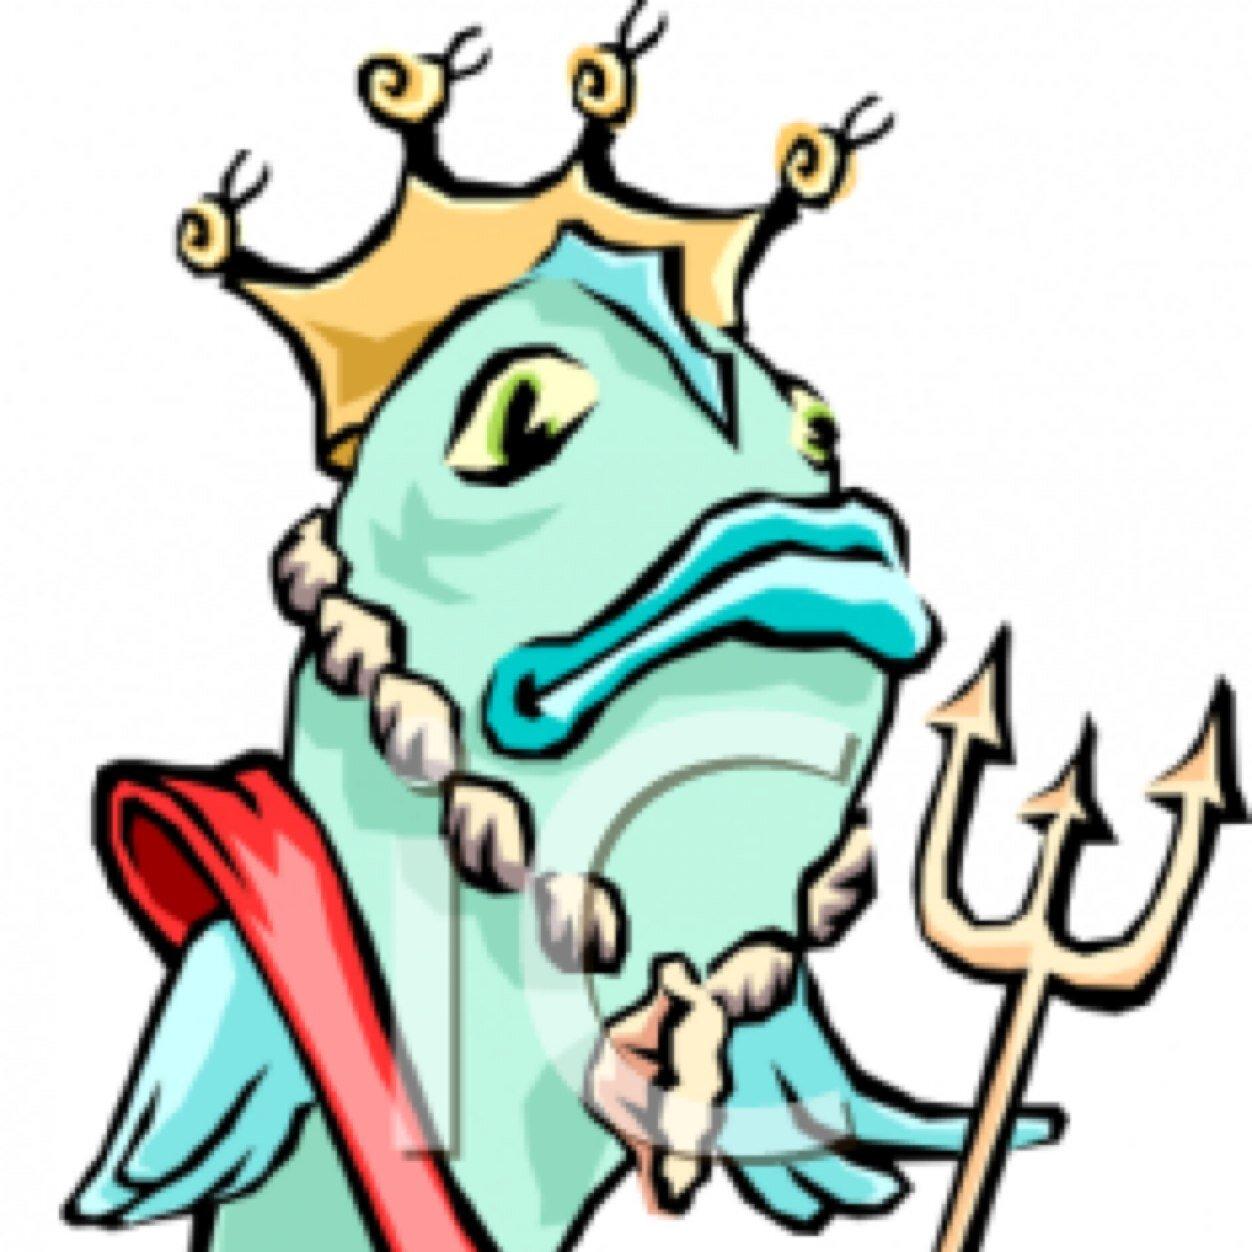 1252x1252 Clipart King Fish Funny Cartoon Royalty Free Cliparts Vectors